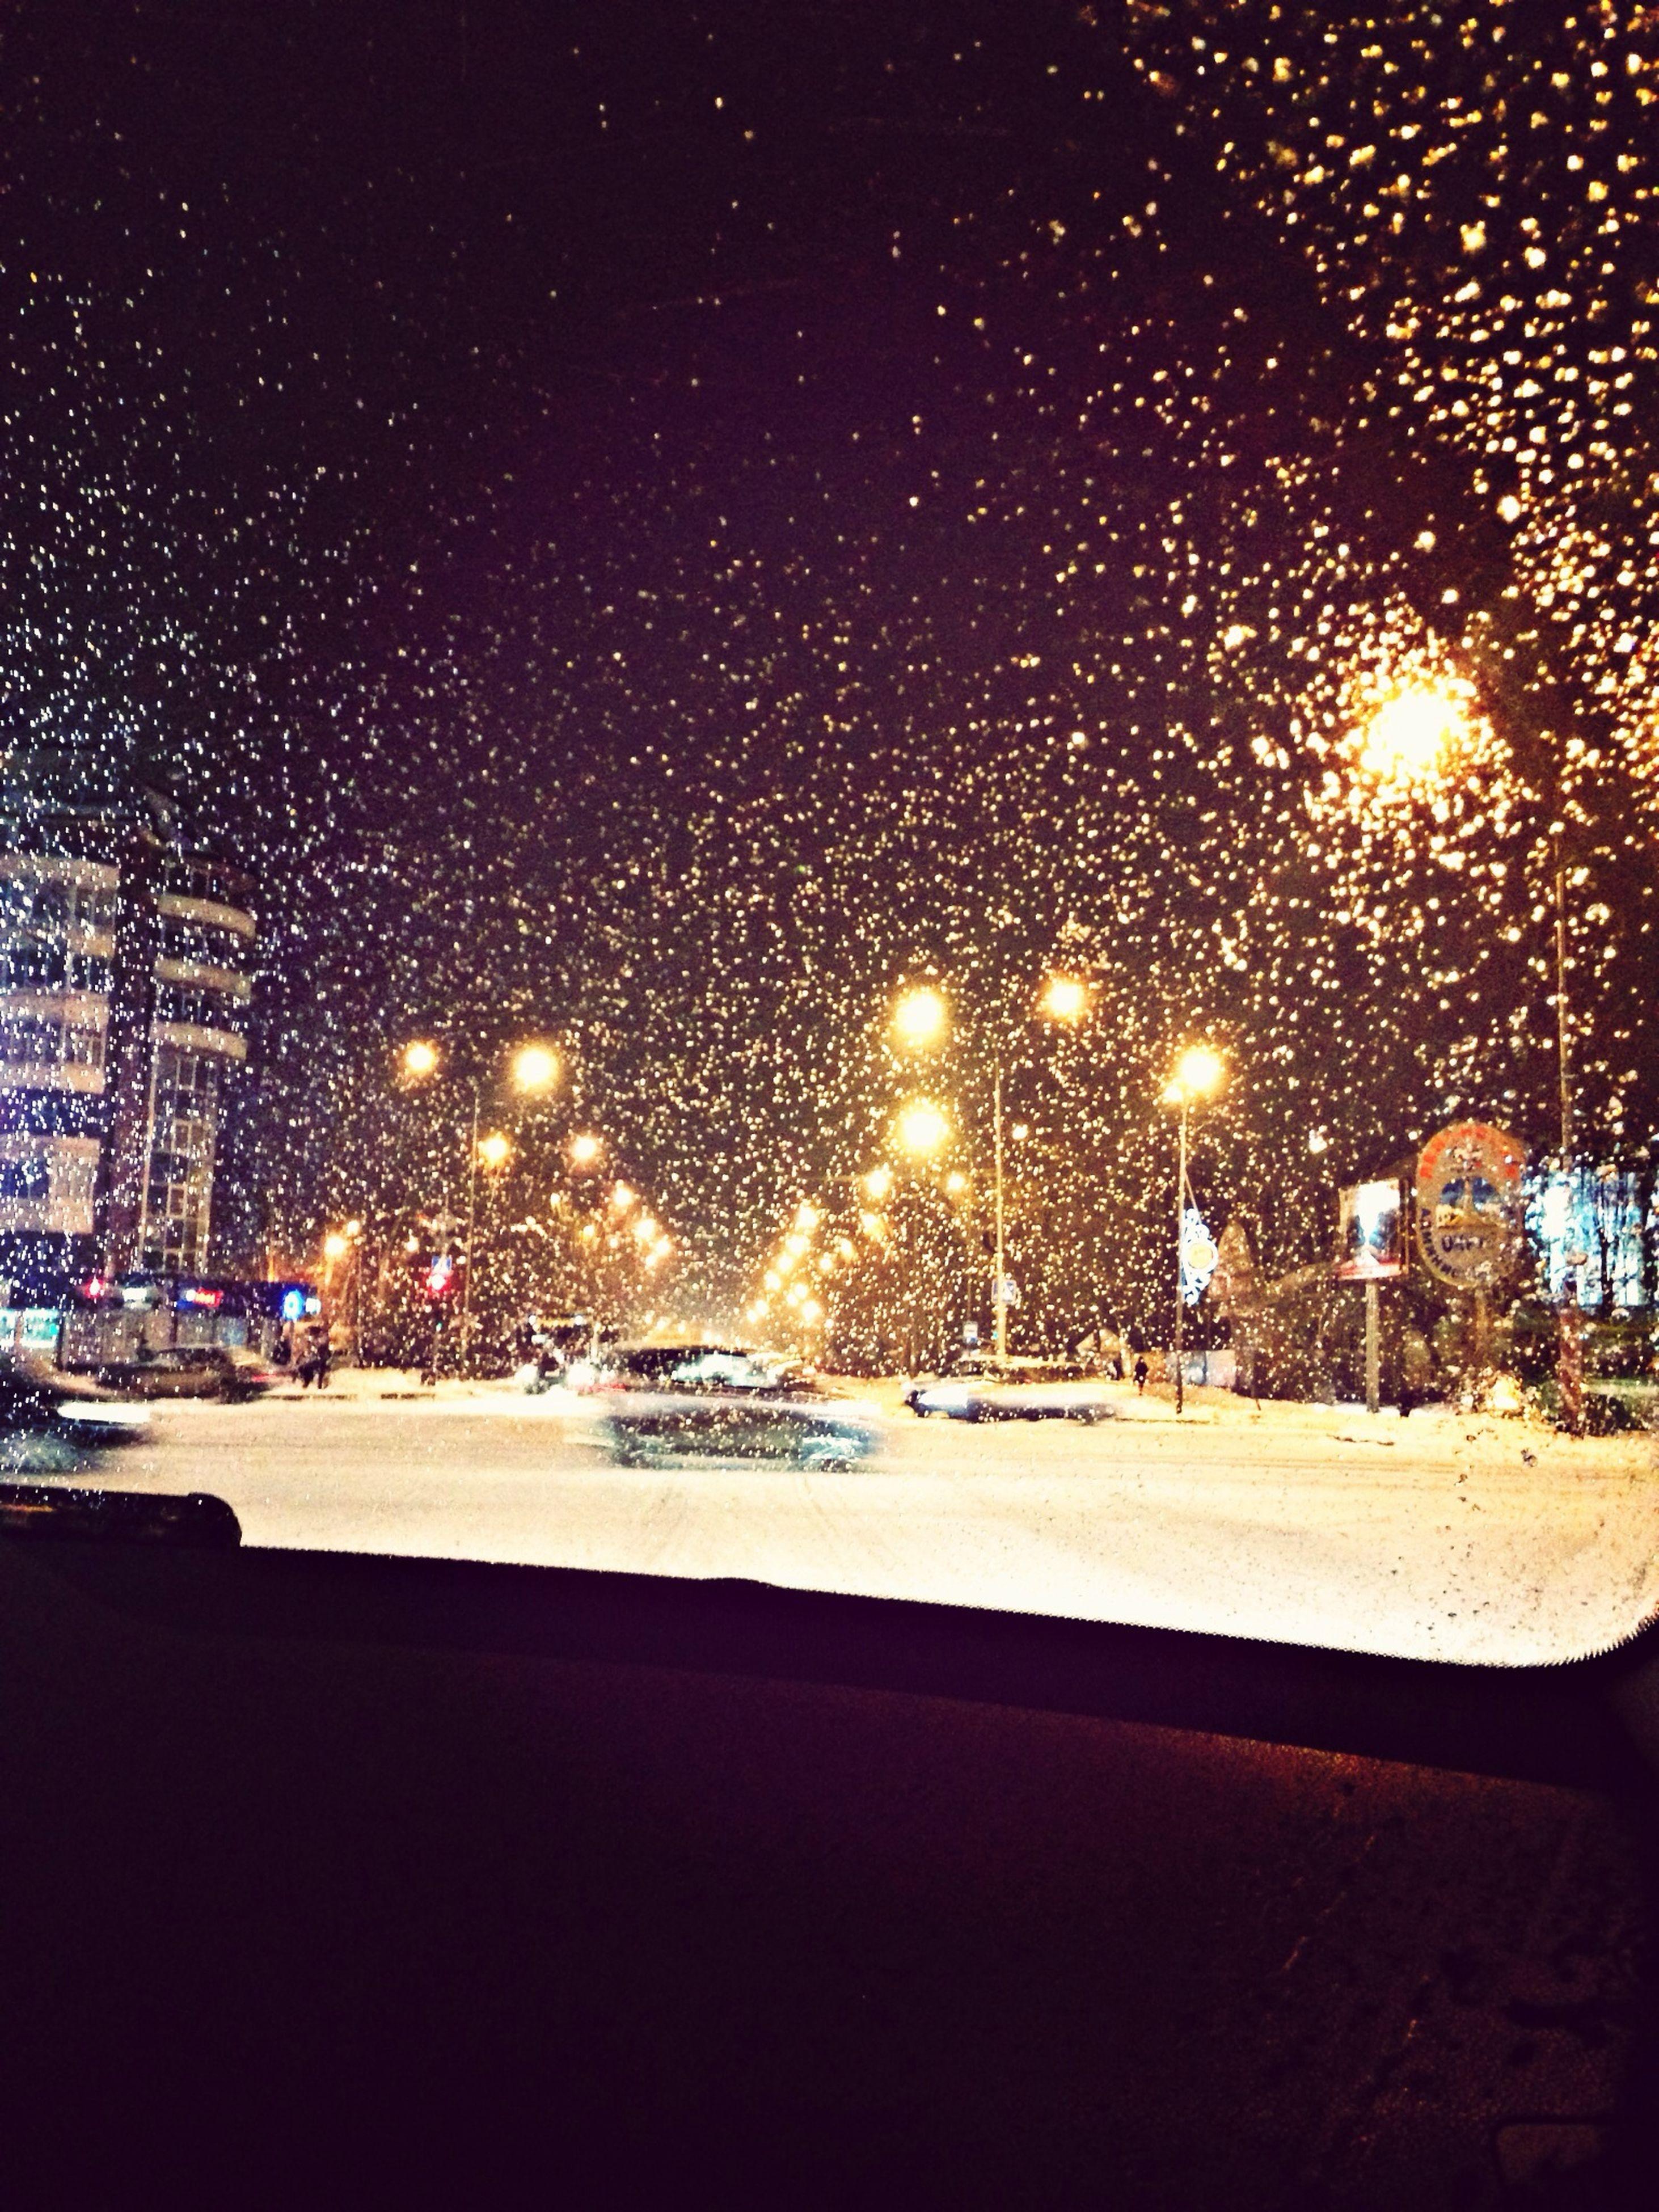 car, transportation, night, land vehicle, illuminated, season, mode of transport, wet, street, city, window, glass - material, rain, road, snow, weather, street light, transparent, building exterior, winter